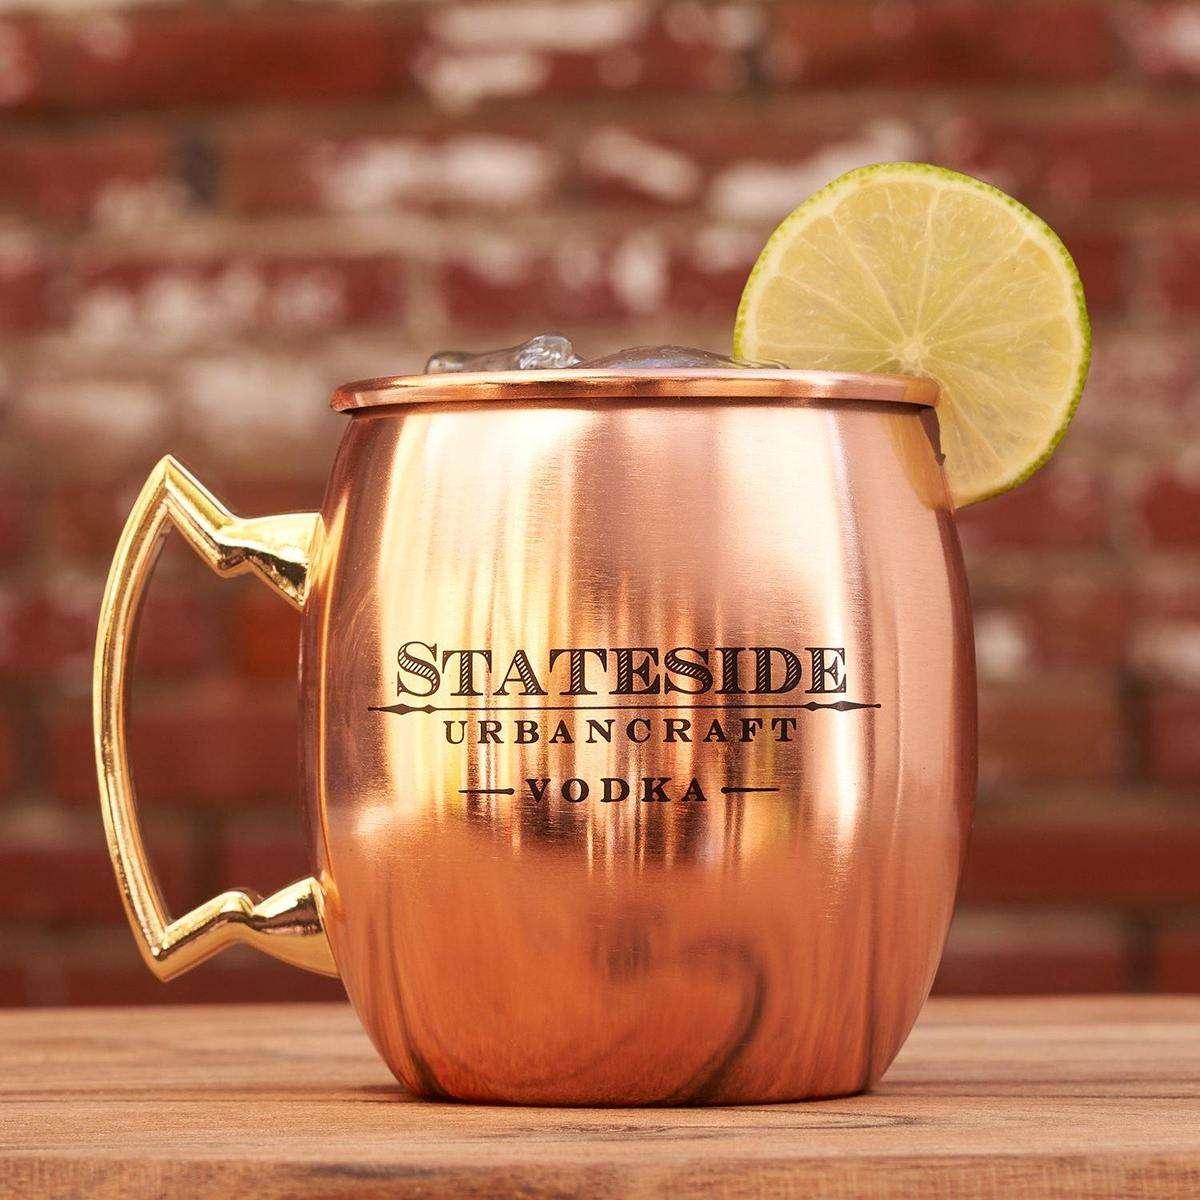 Stateside Mule